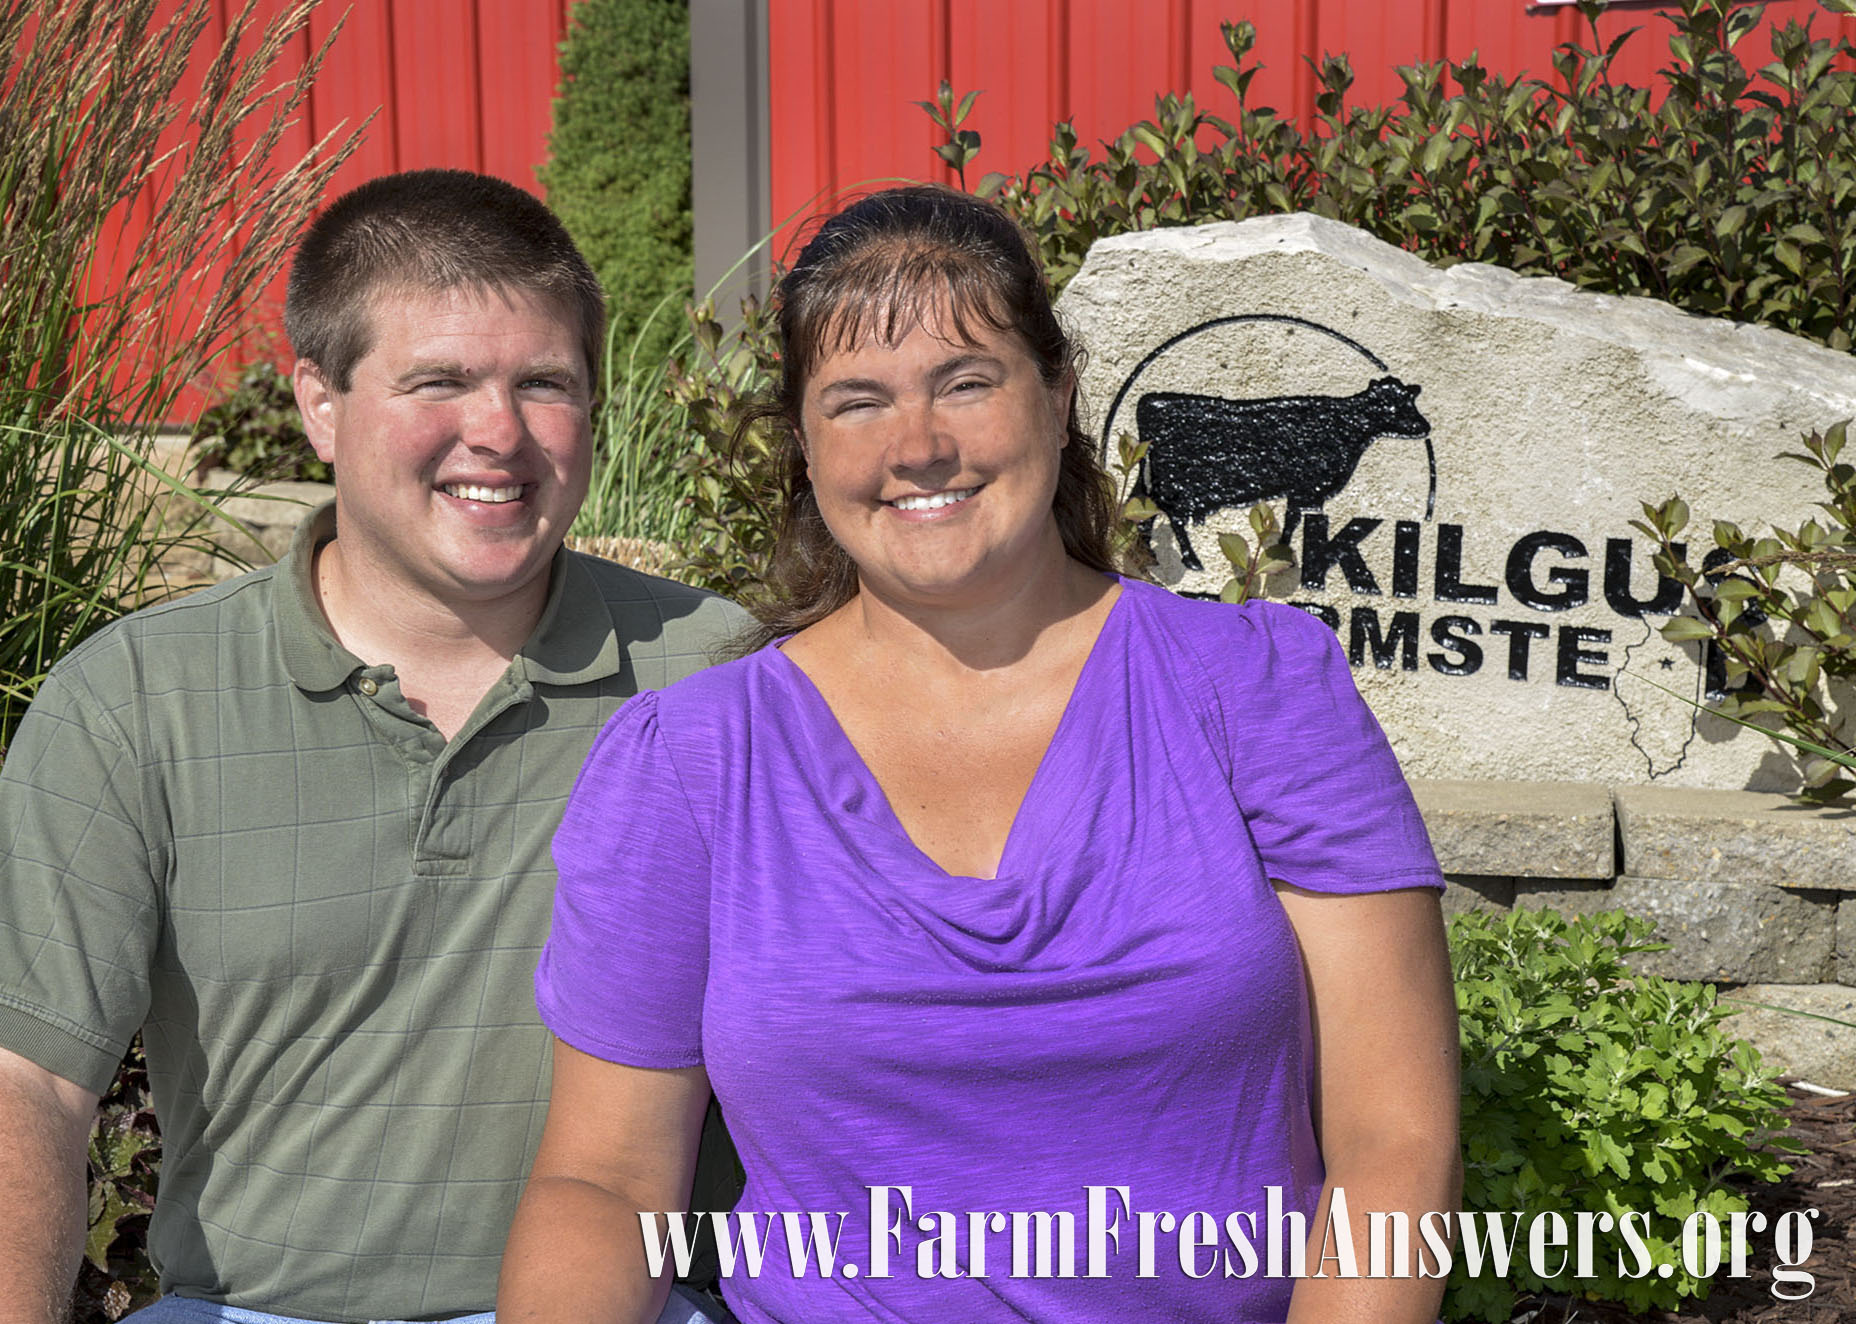 Matt & Jenna Kilgus bottle milk from their family's herd of Jersey dairy cows right on their farm near Fairbury. Photo courtesy of Illinois Farm Bureau